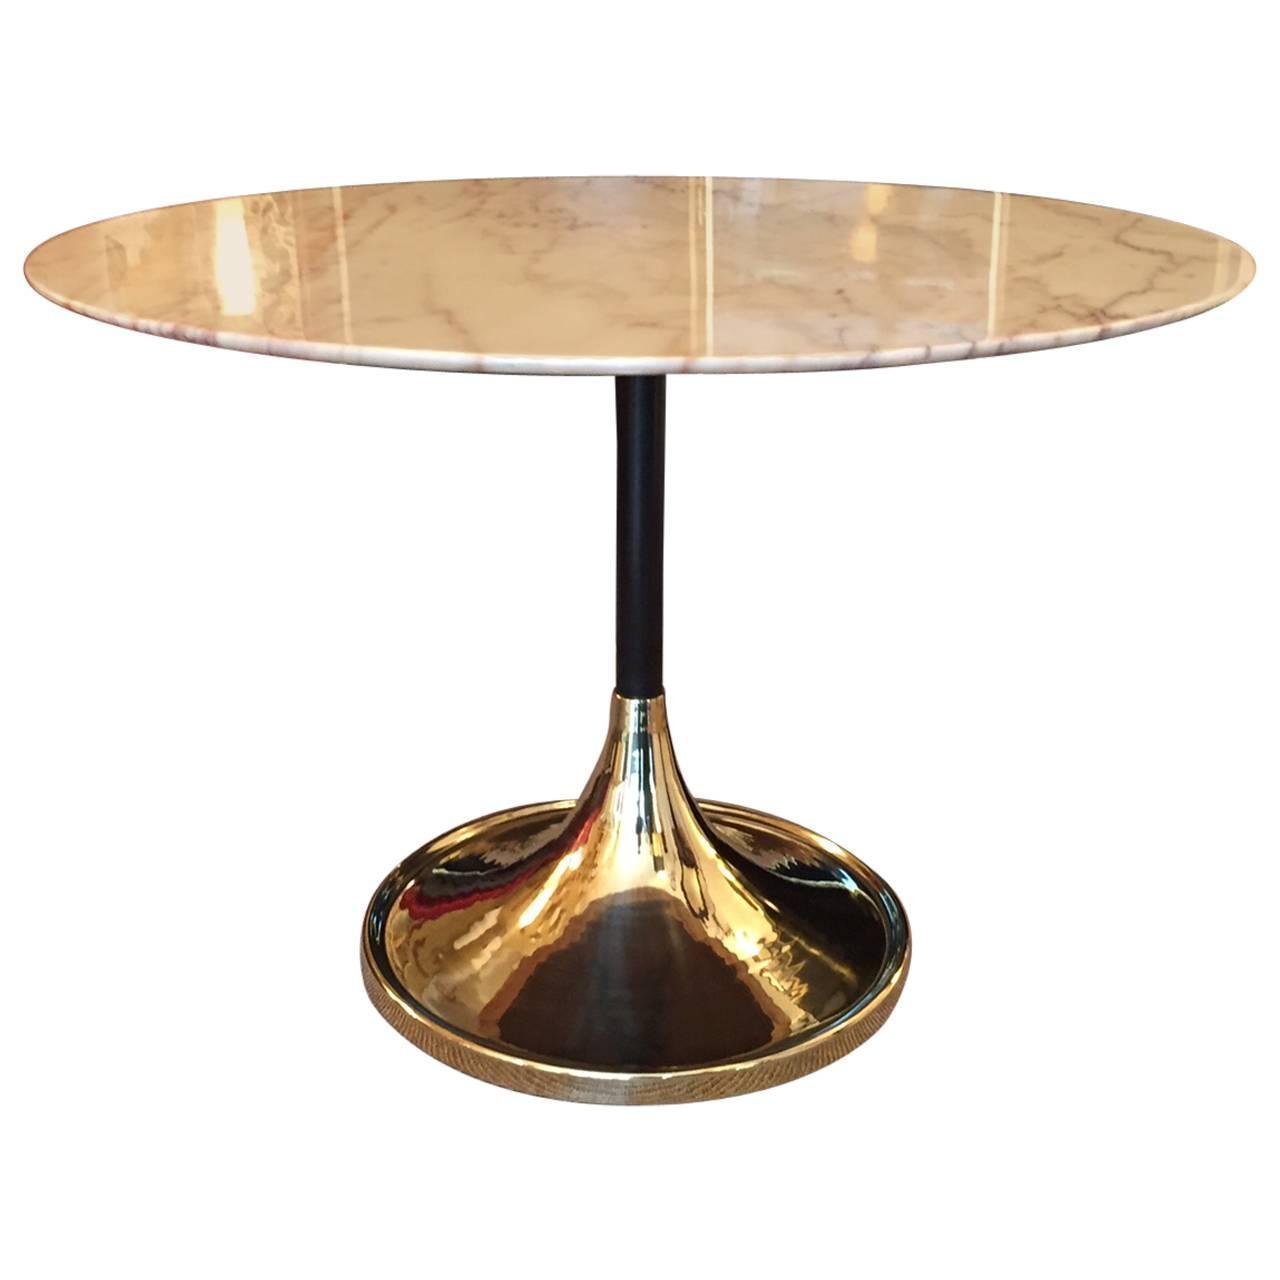 1970s Italian Tulip Base Round Marble Table At 1stdibs